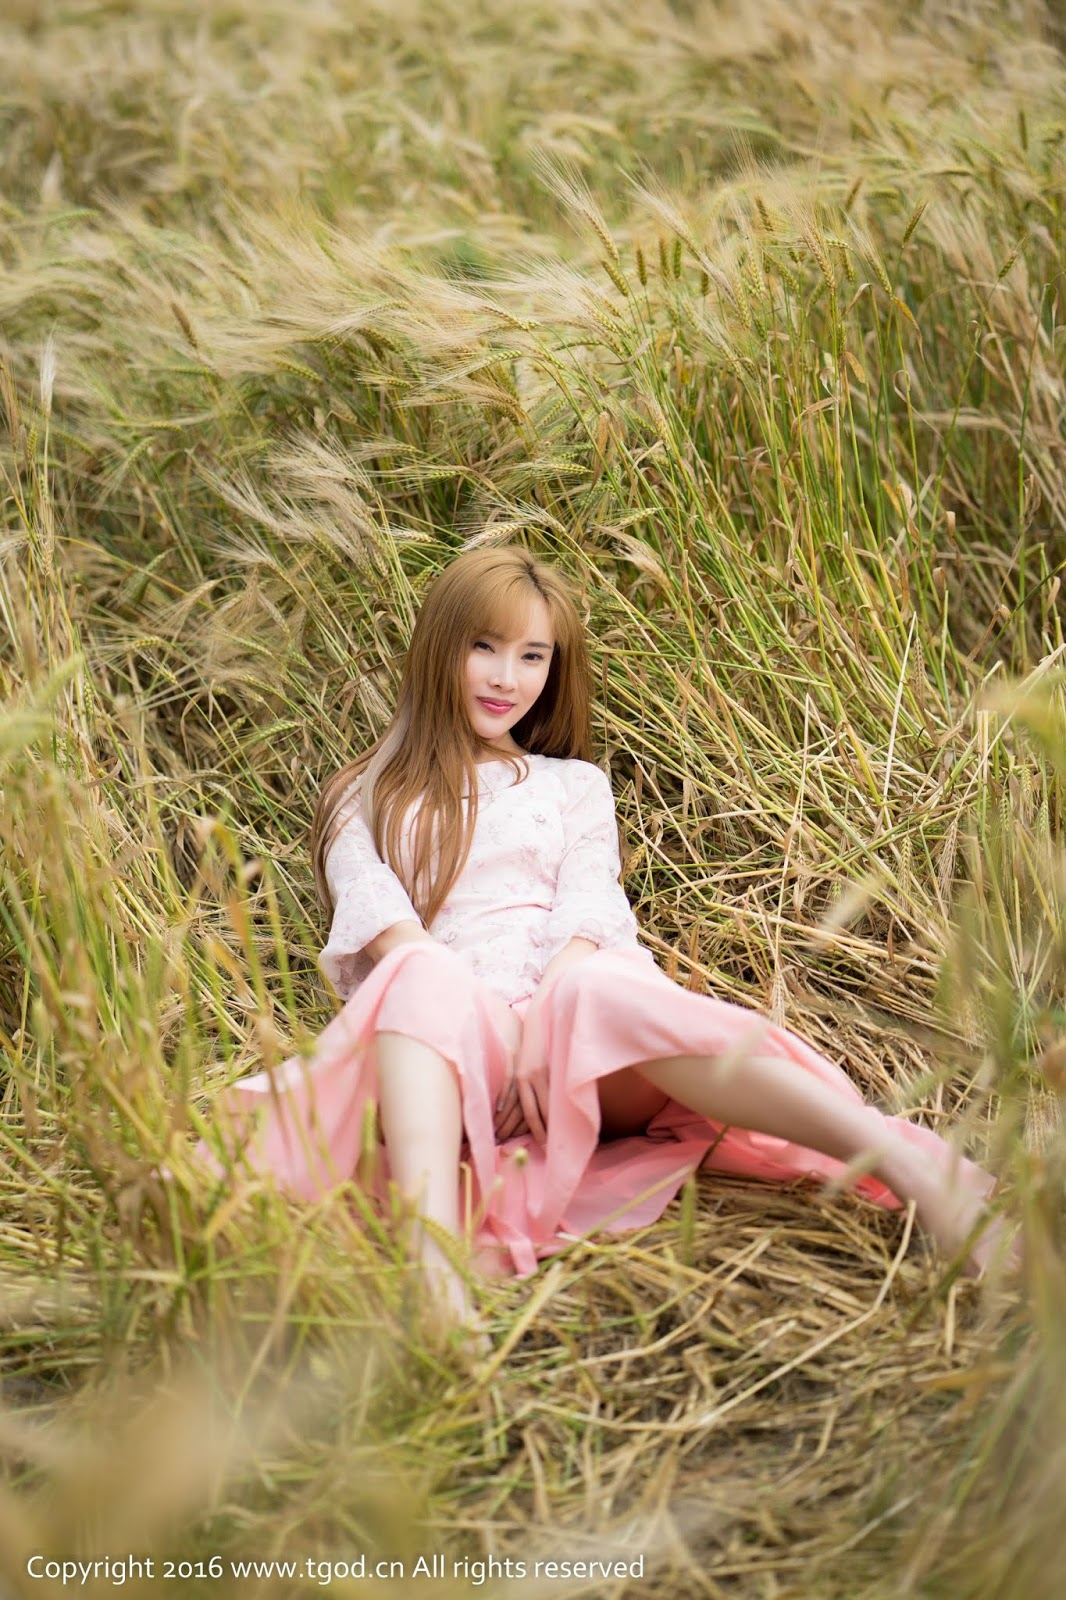 Chinese Girl 周妍希 - 土肥圆矮挫穷 TGOD 2016.06.07 (45 Pict)